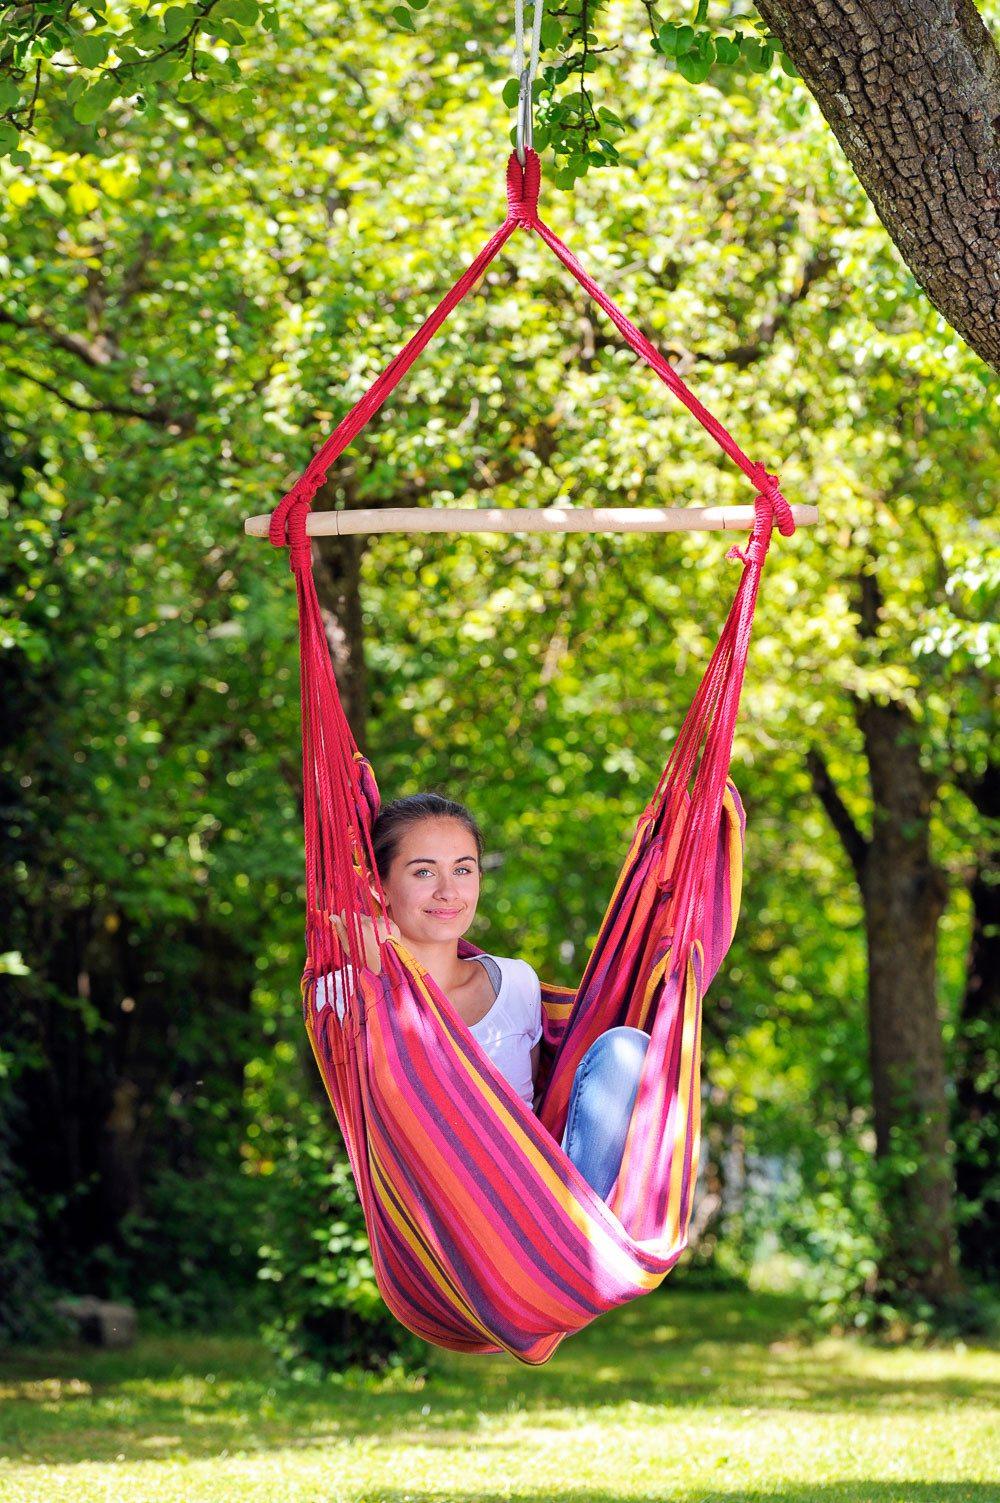 Amazonas Relax Hængestol - flere varianter